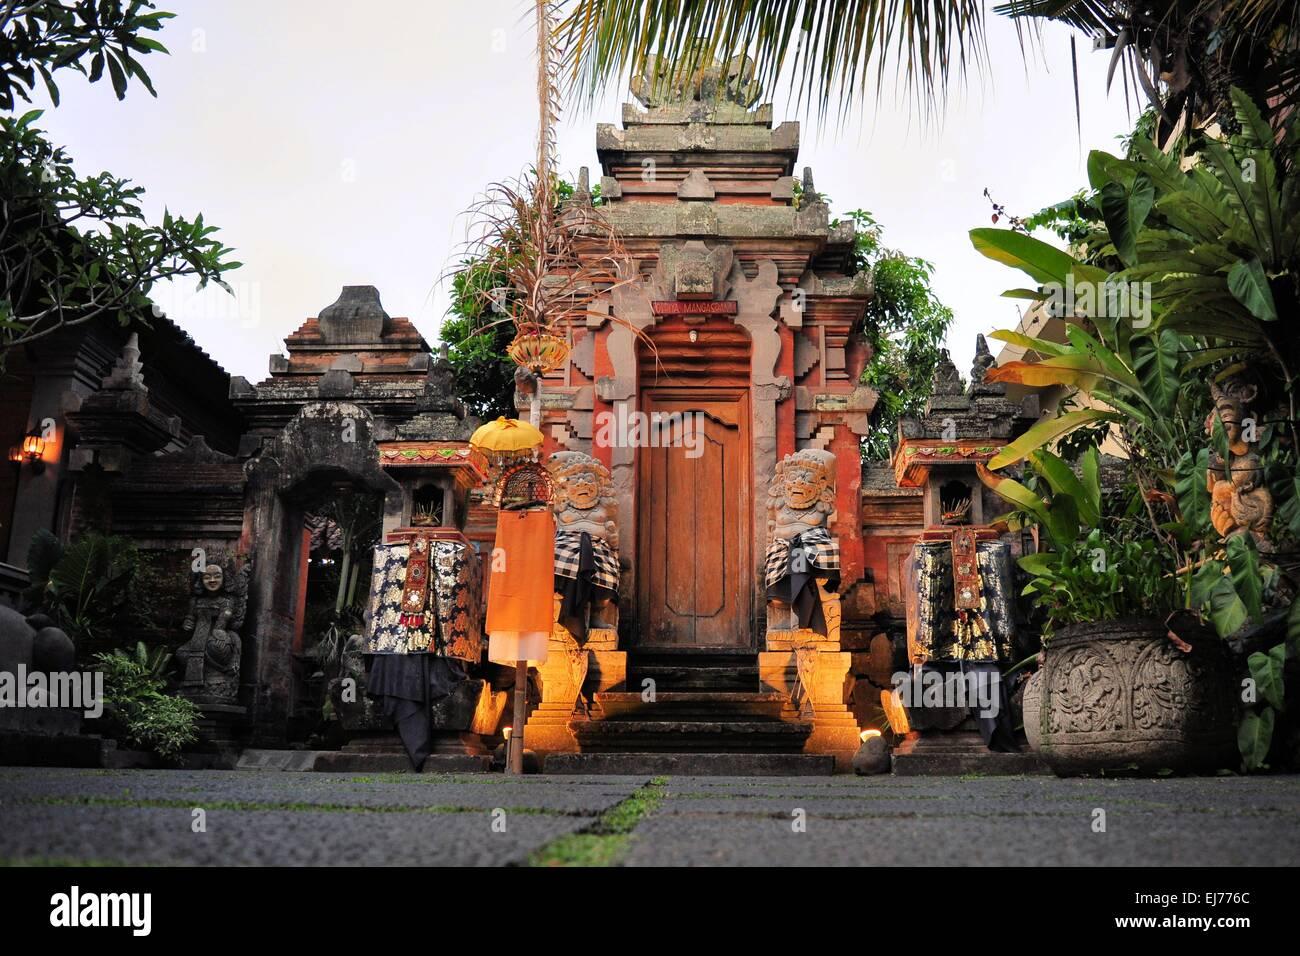 Hindu temple, Ubud, Bali - Stock Image